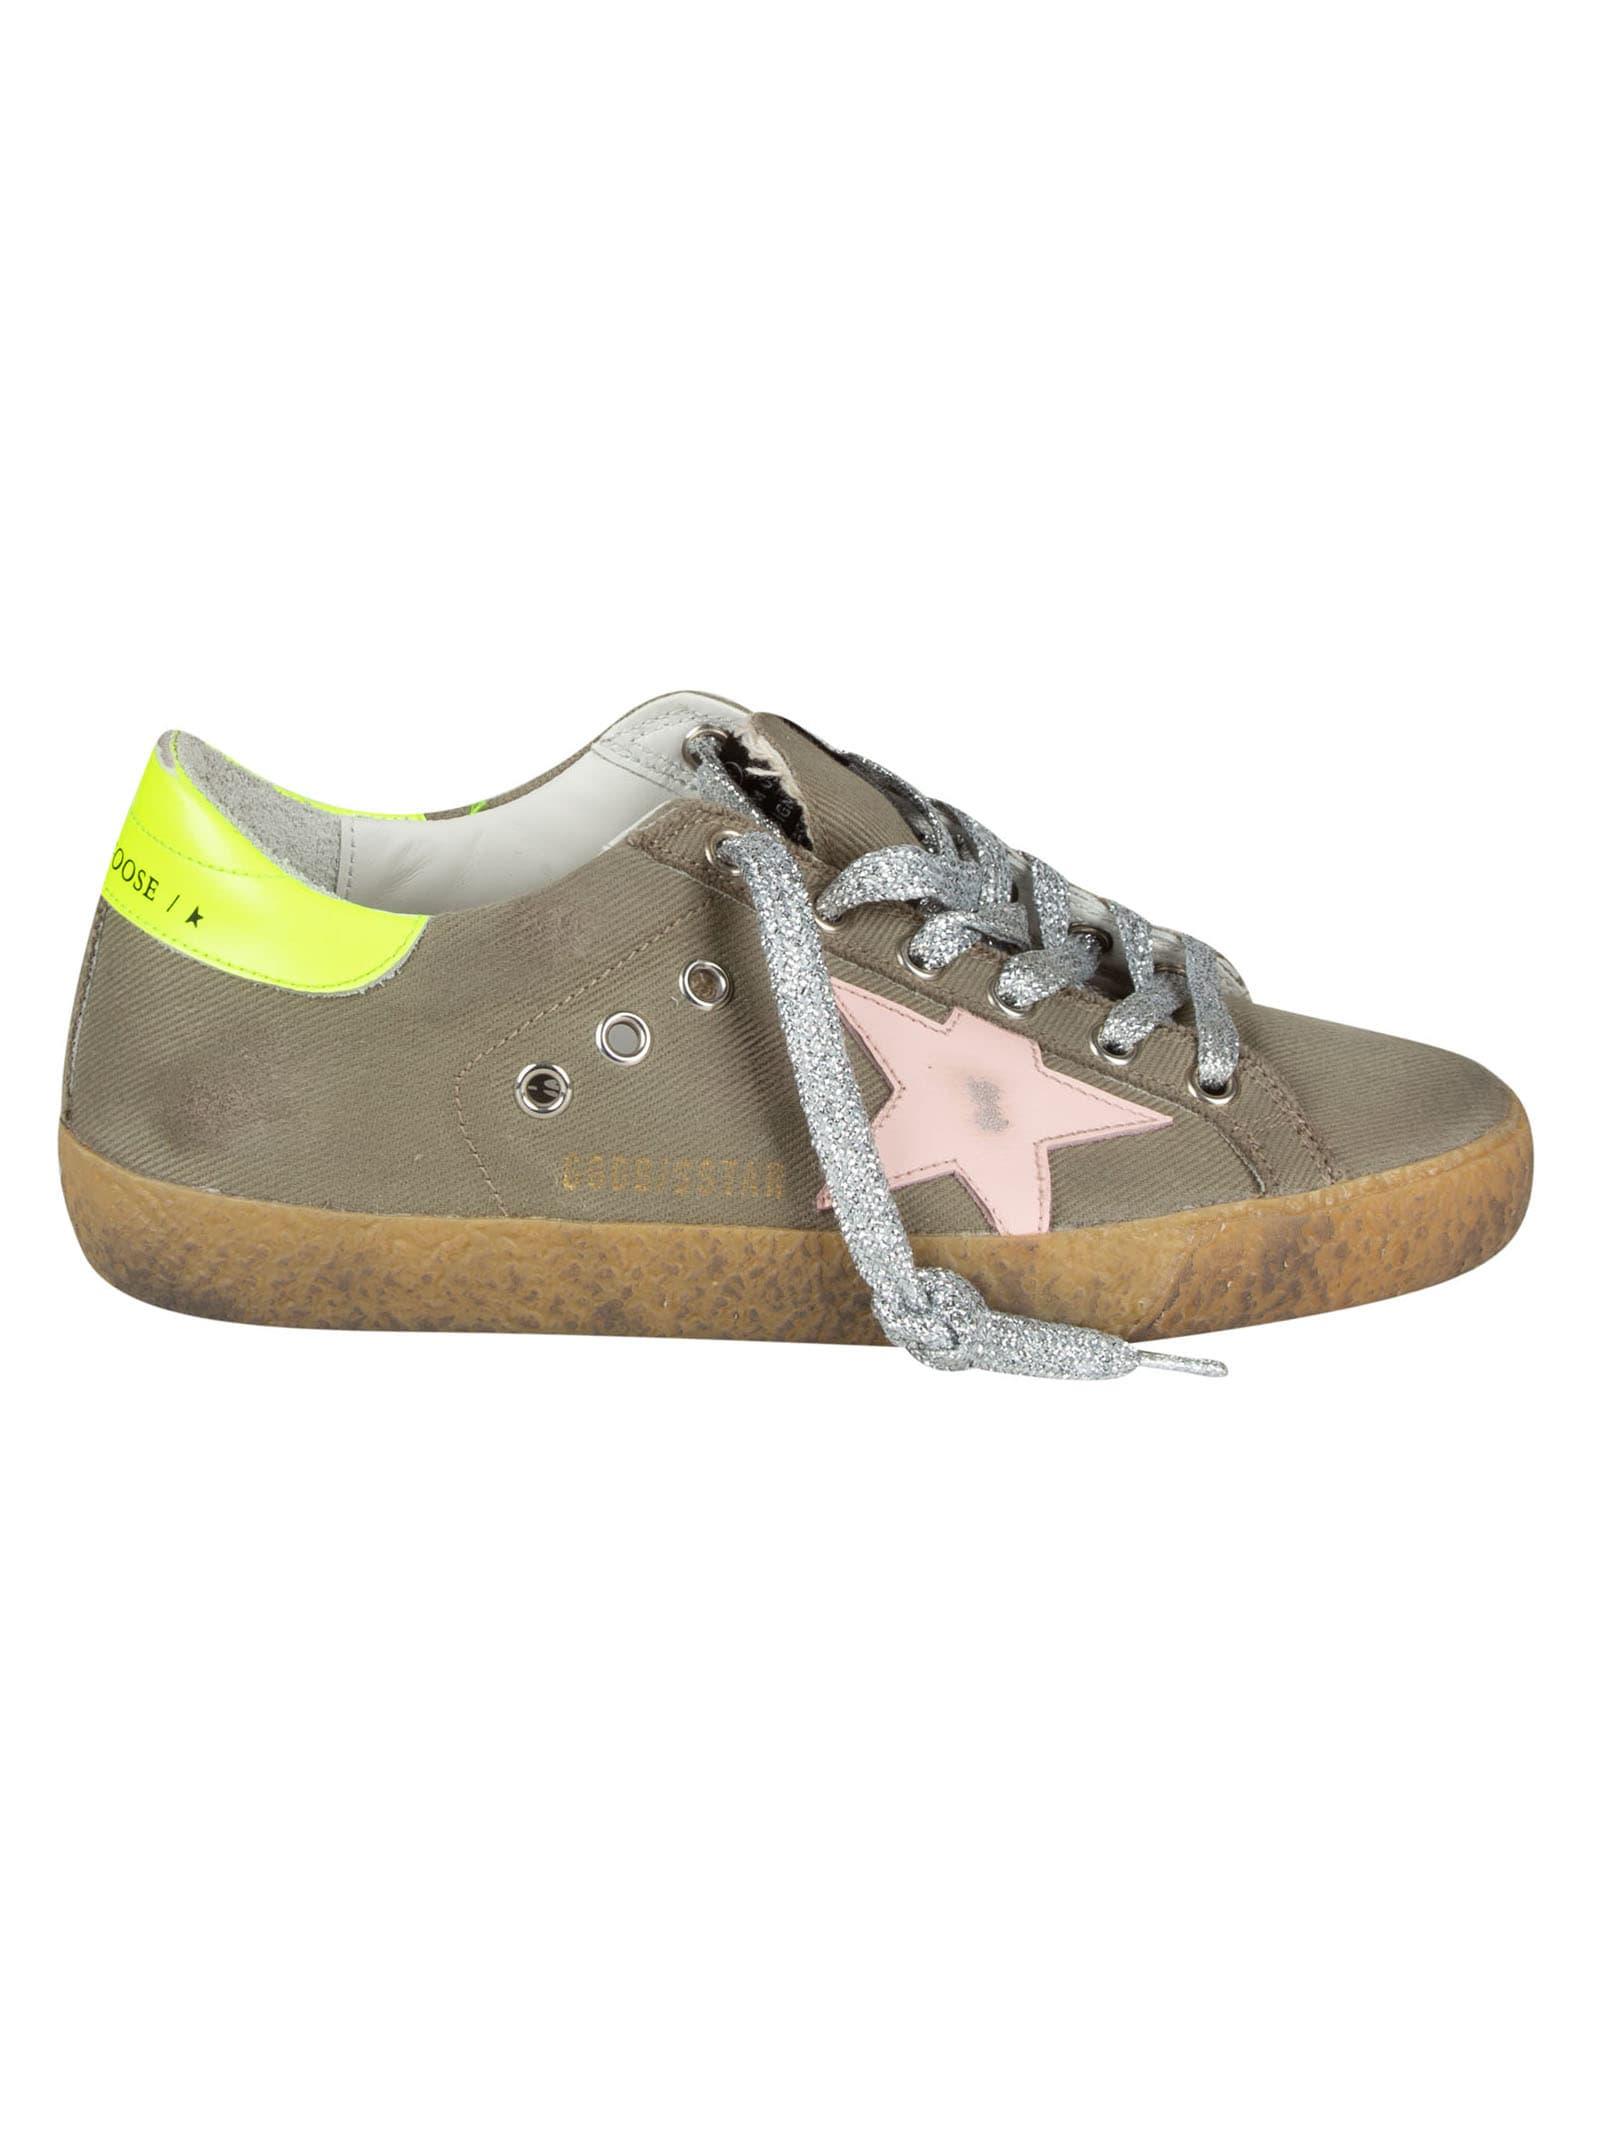 Golden Goose Super-star Classic W/ List Sneakers